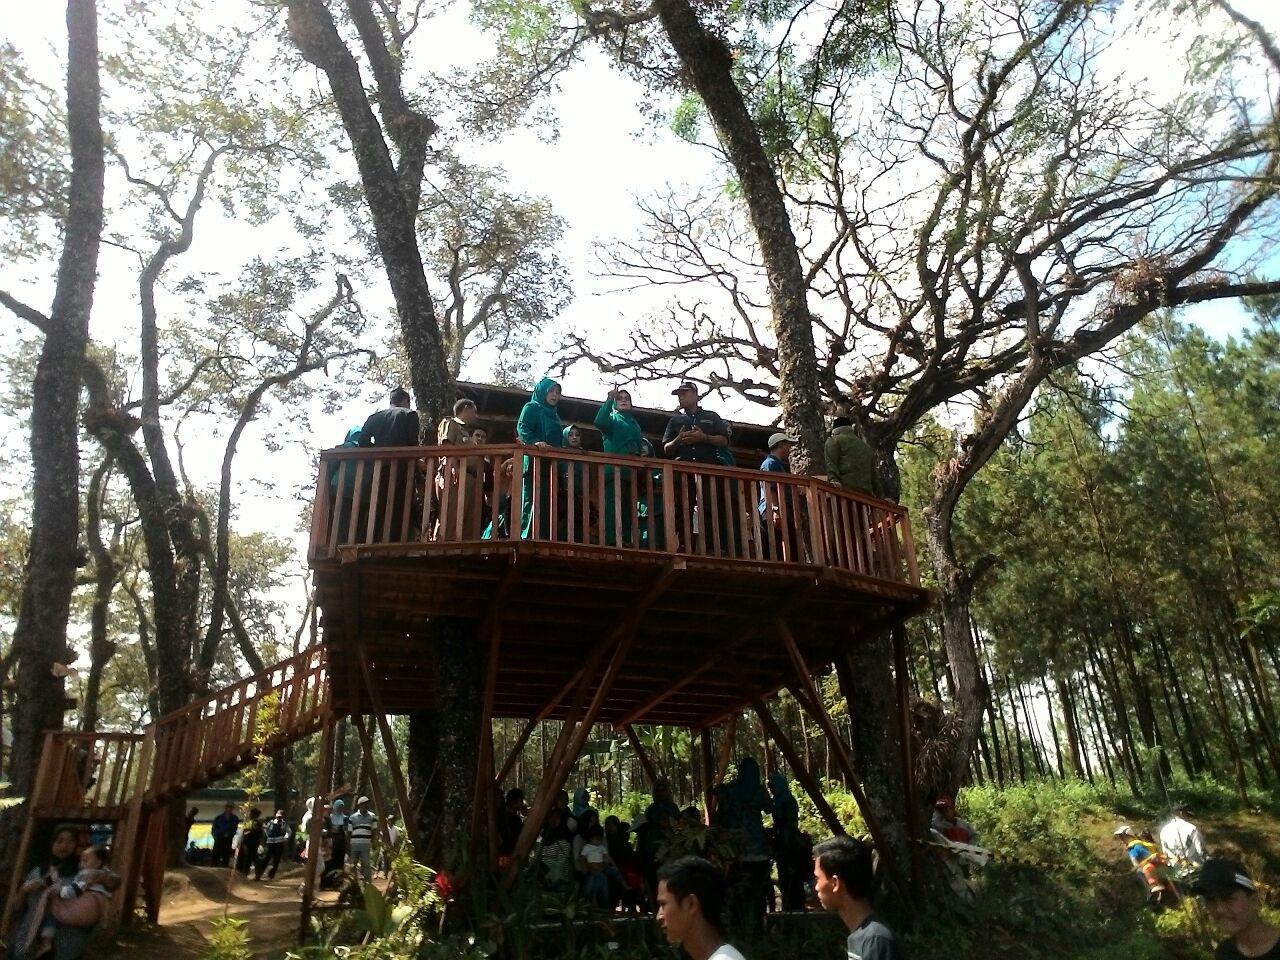 Peristiwa Destinasi Wisata Kampung Enem Patokpicis Bukti Program Hj Jajuk